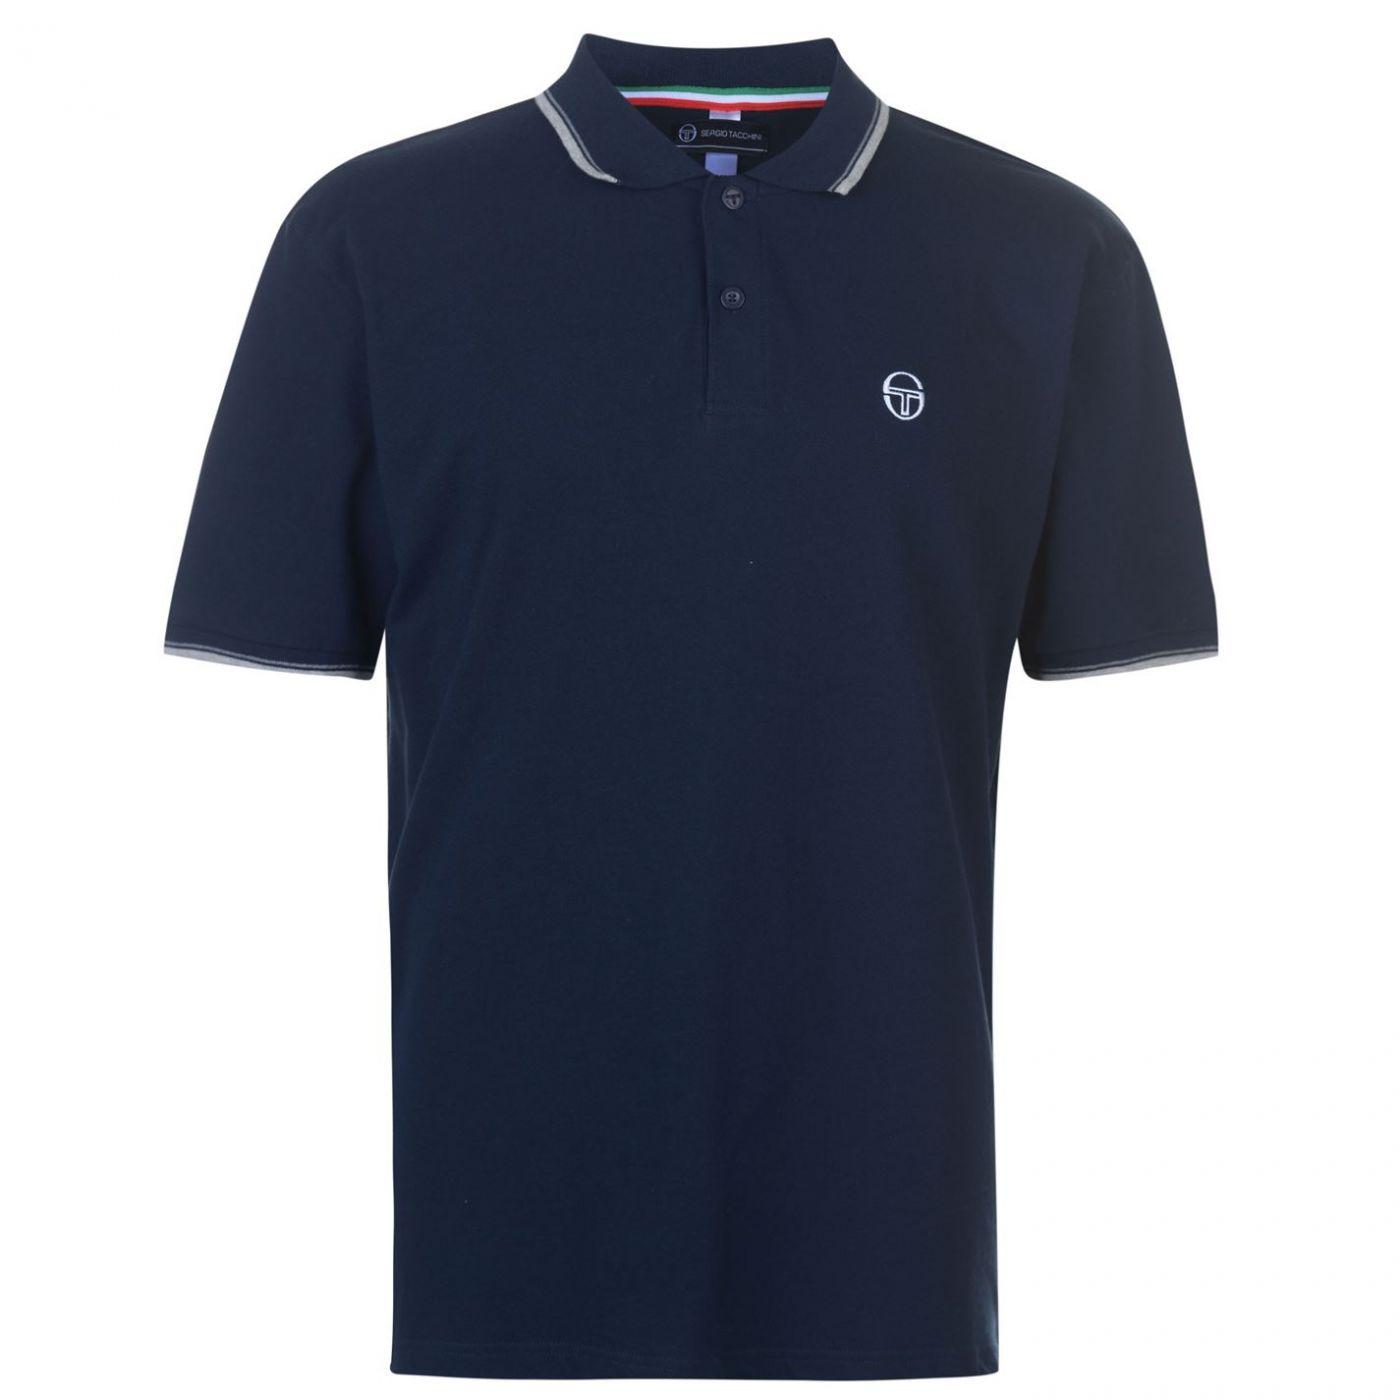 Sergio Tacchini Zuck Polo Shirt Mens